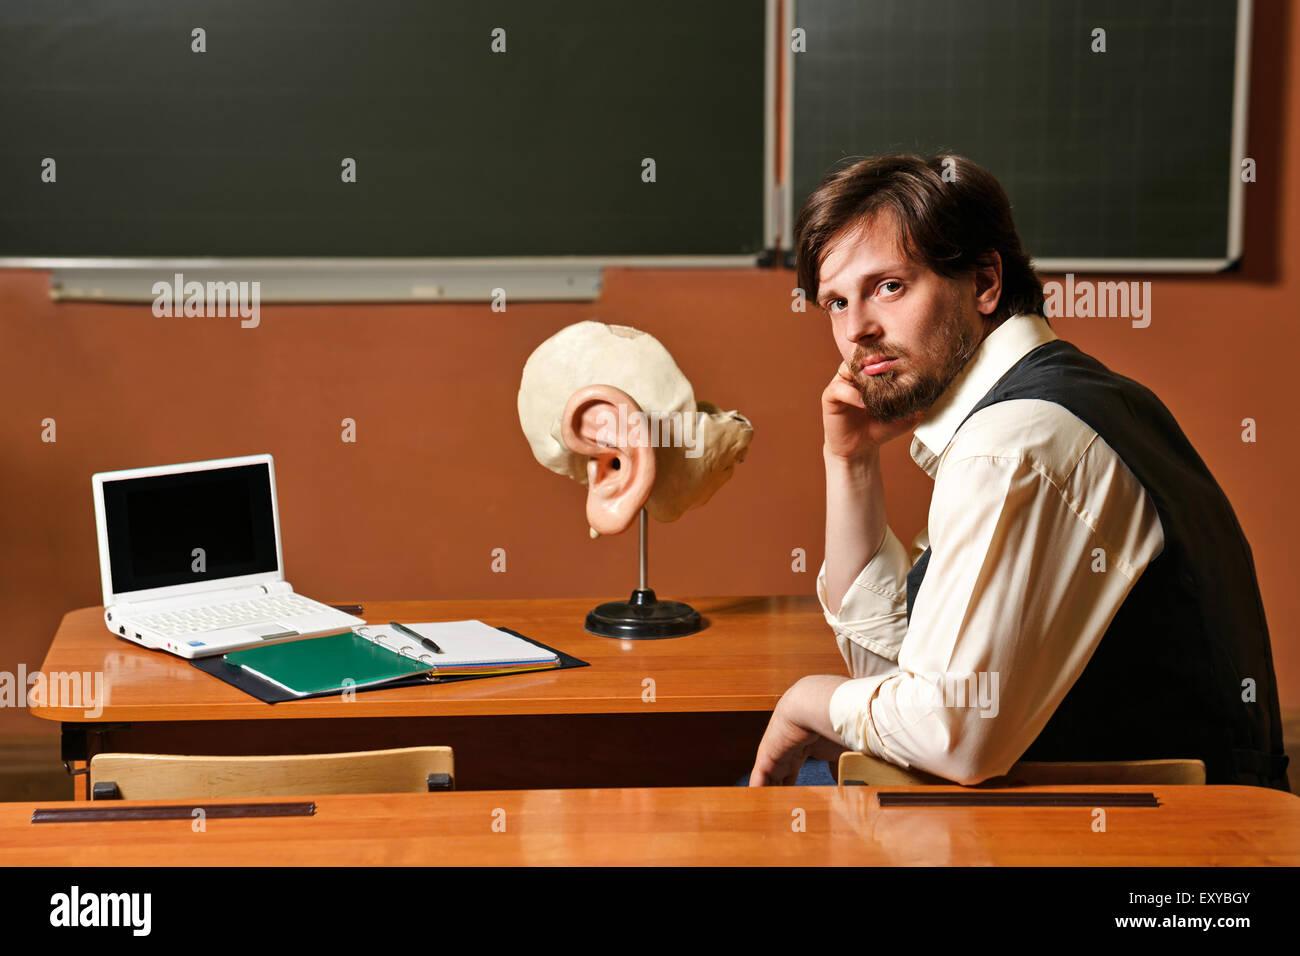 Male anatomy teacher sitting at a school desk. Back to school. - Stock Image